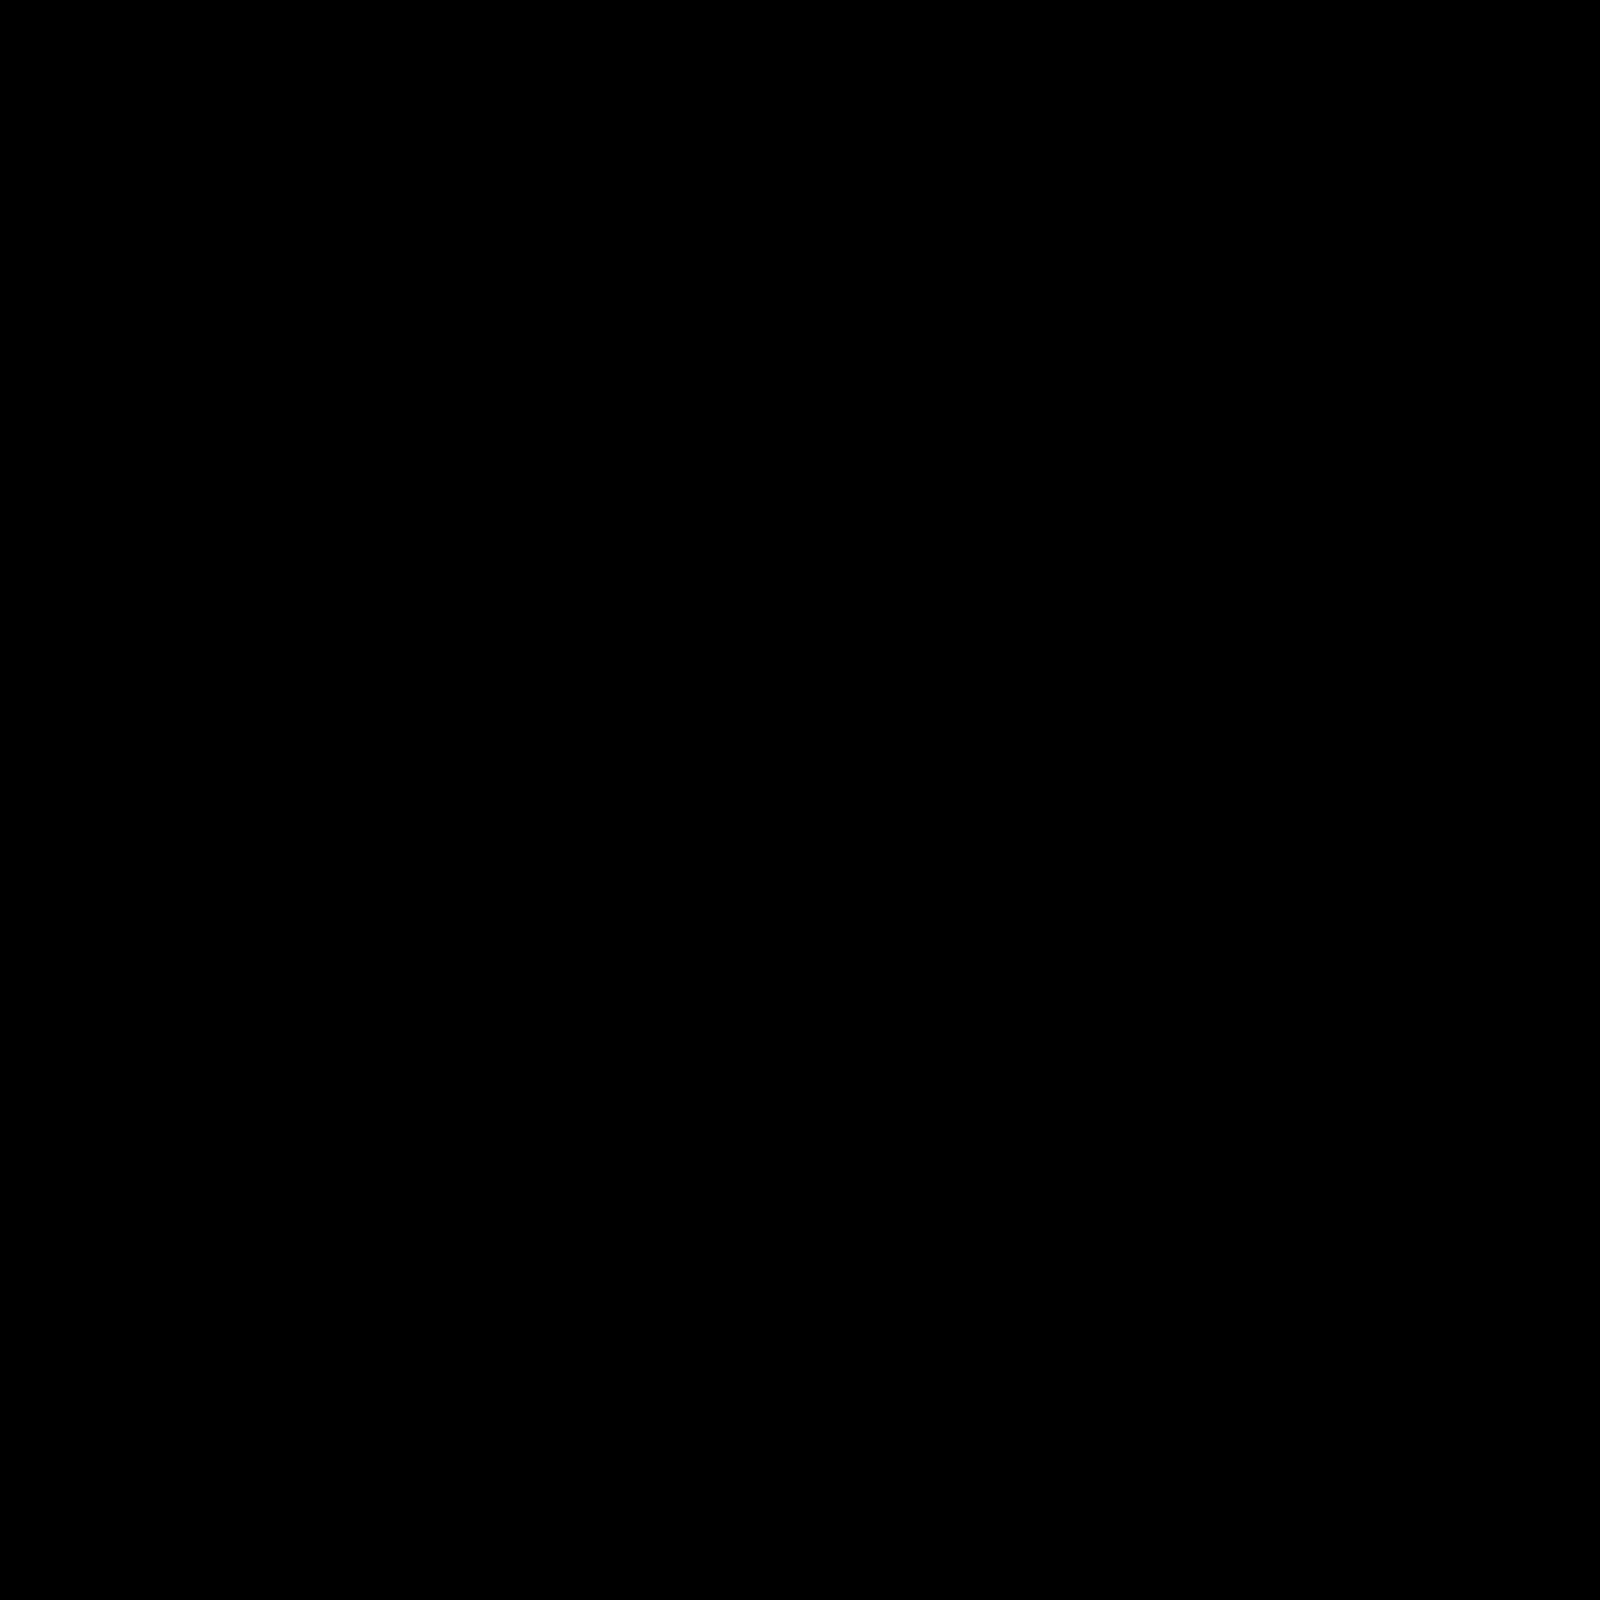 Server Icon Vector #299638.